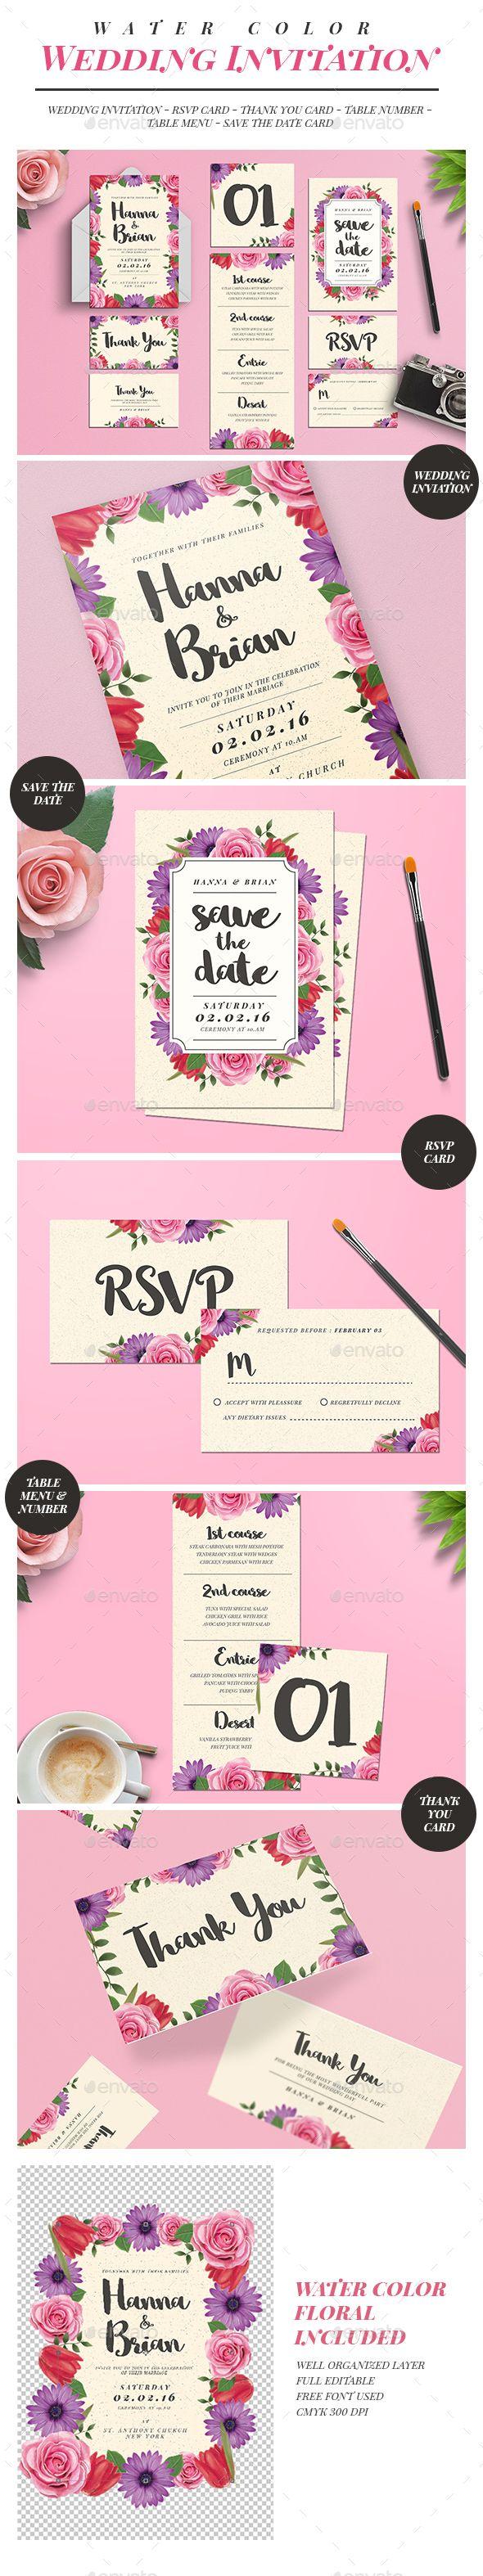 59 best wedding card m images on pinterest invitation cards watercolor floral wedding invitation suite stopboris Images